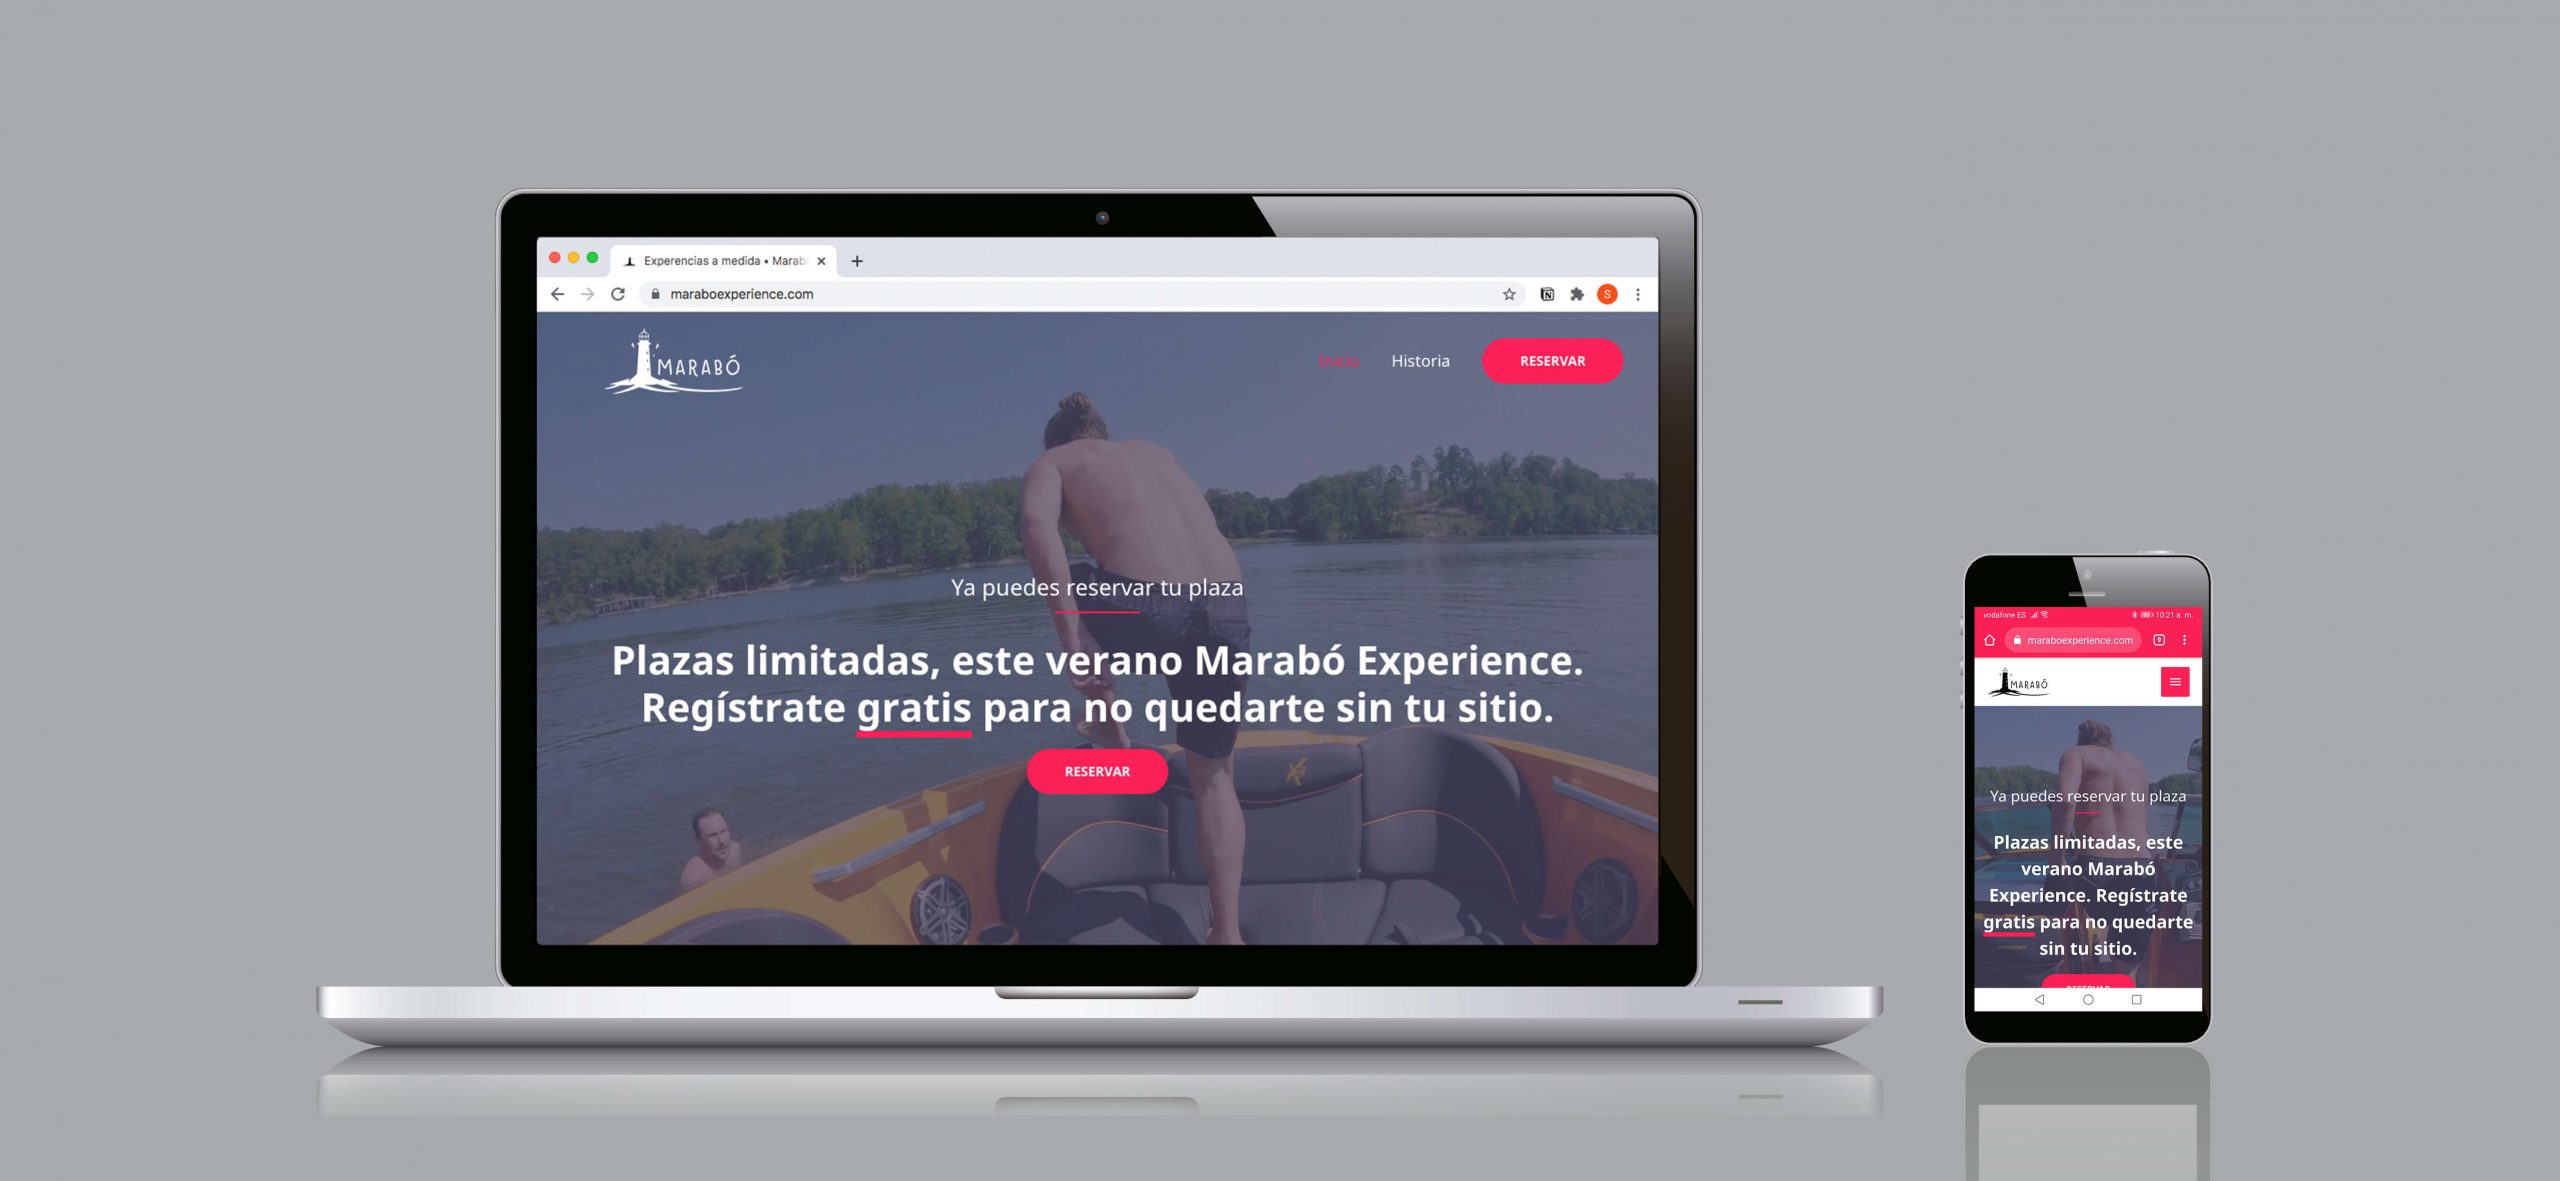 Marabó Experience